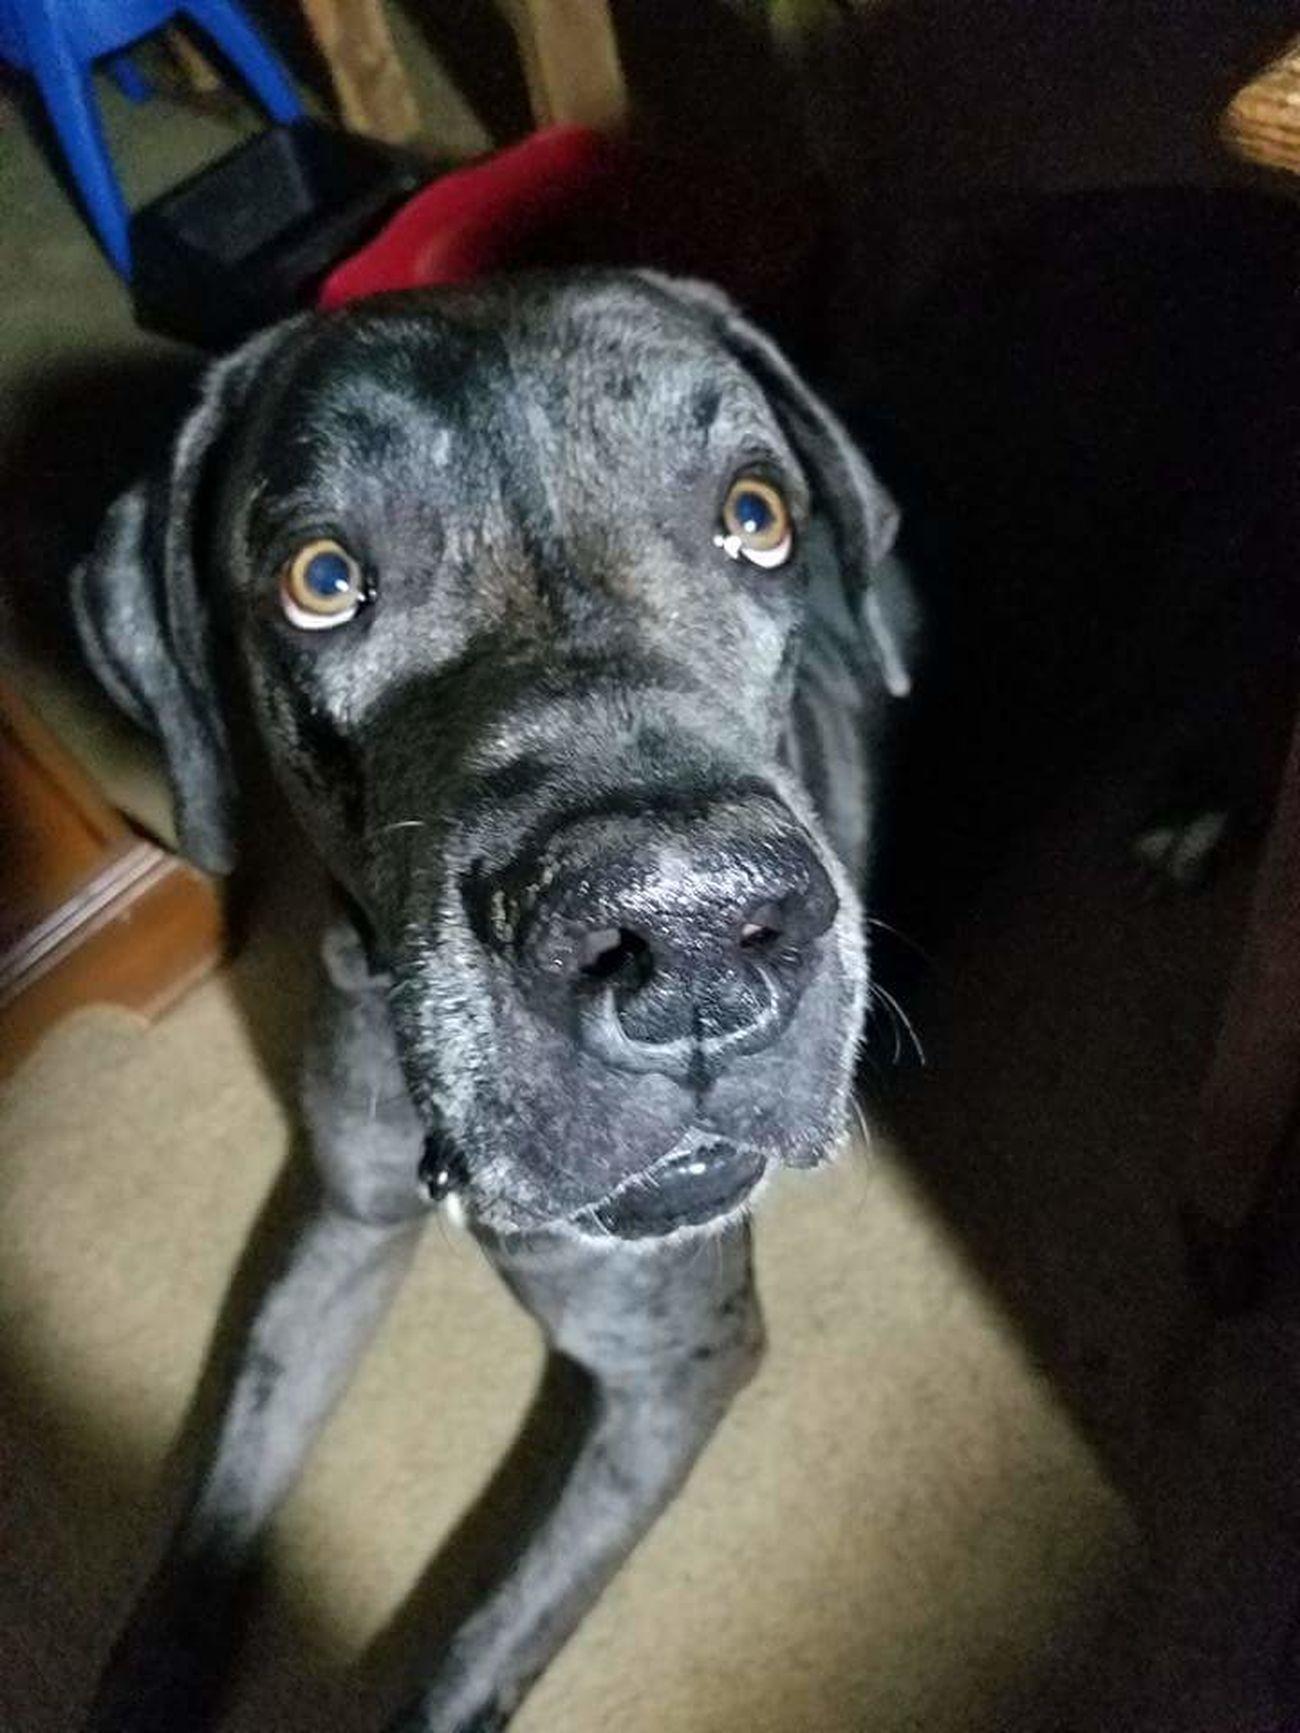 Jack the Great Dane Great Dane Dog Canine Giant Ujustgotkaied